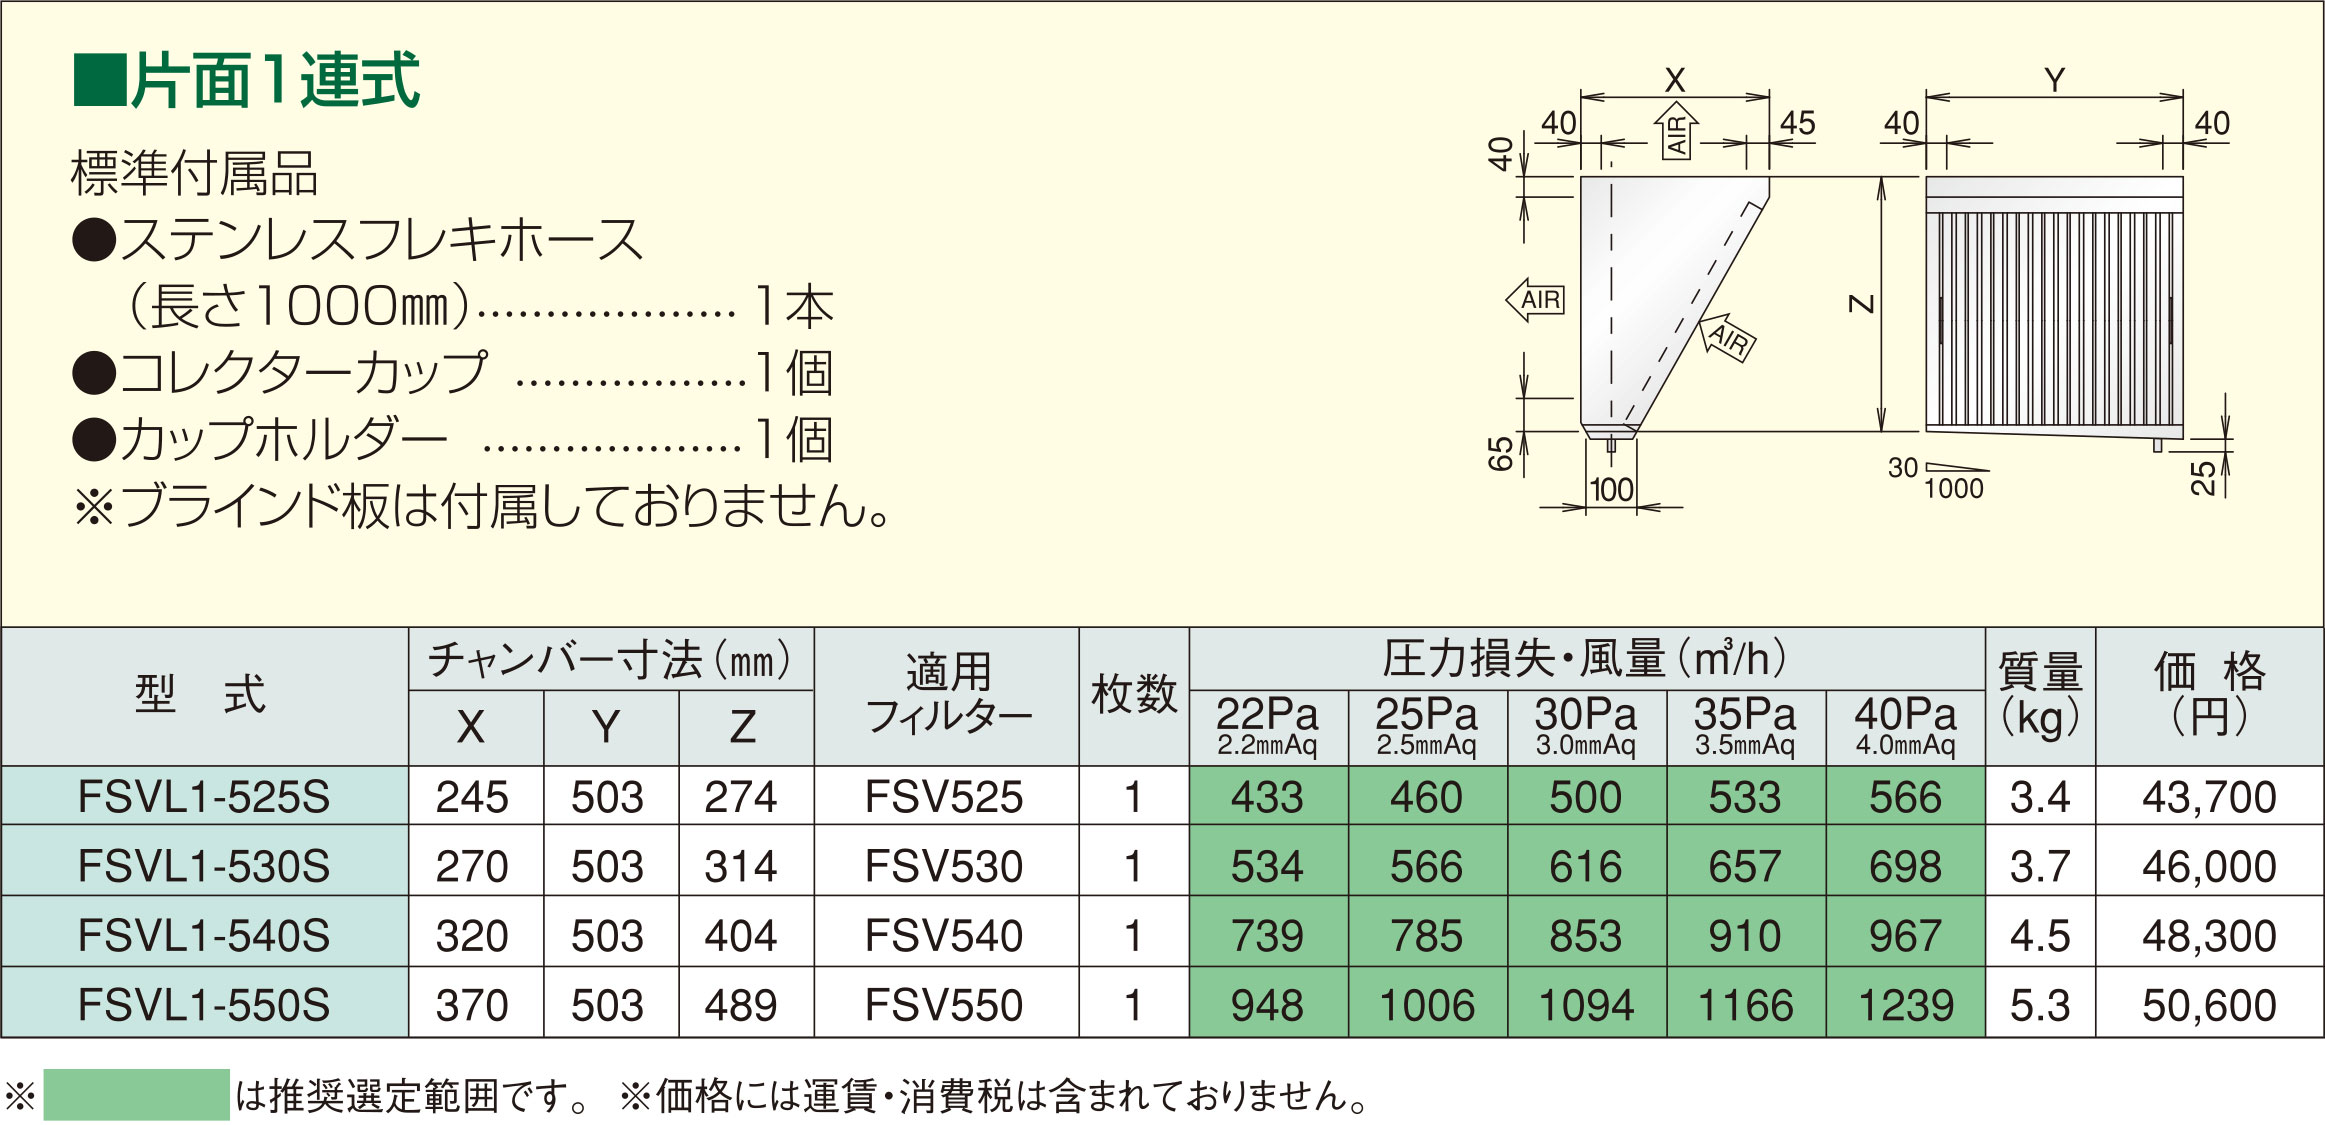 FSVL1-Sシリーズ